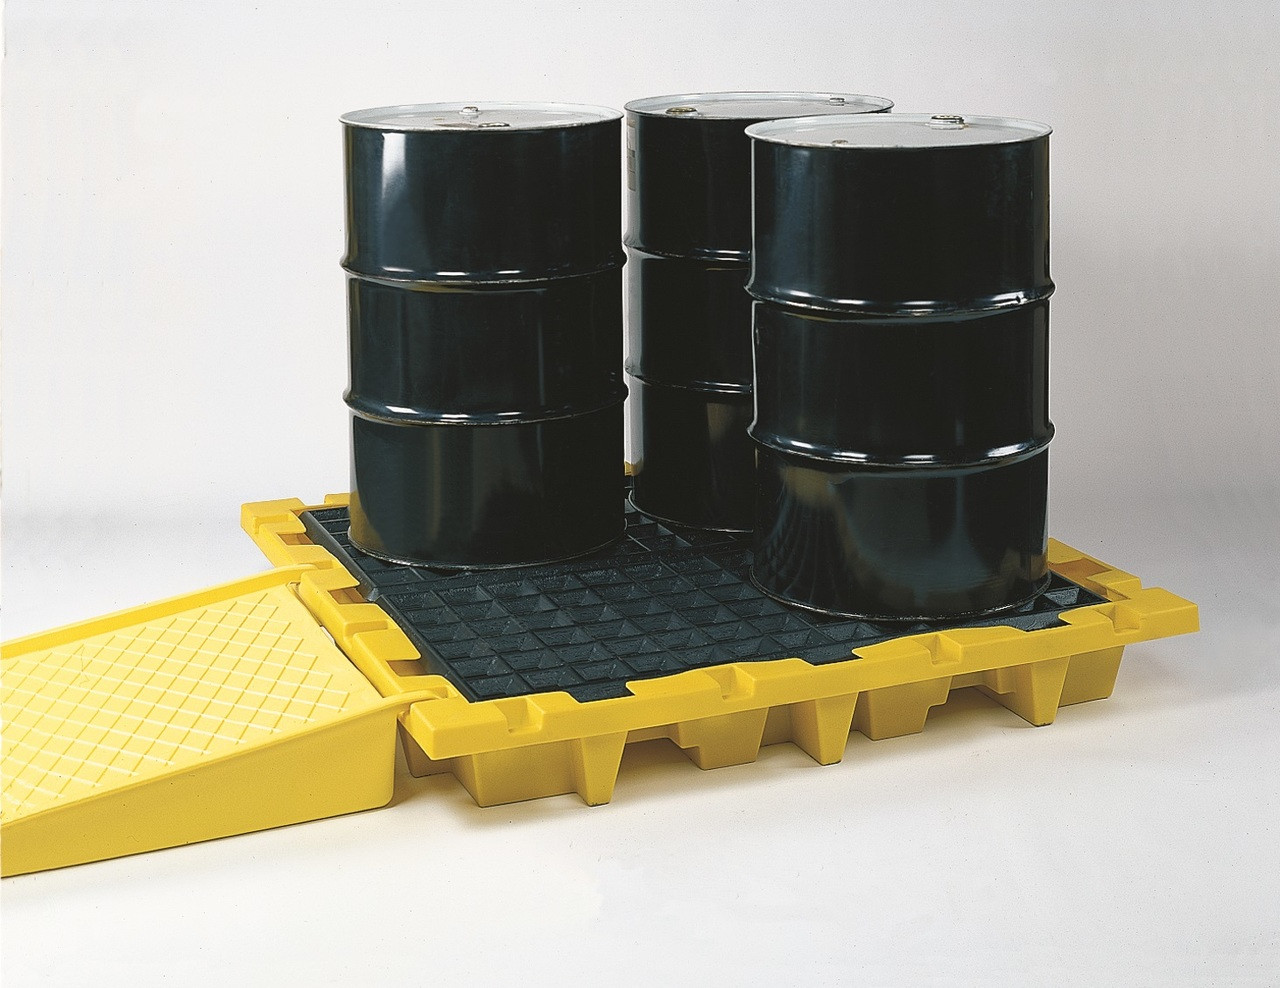 Eagle 1646 Spill Containment Pallet - Nestable - 4 Drum